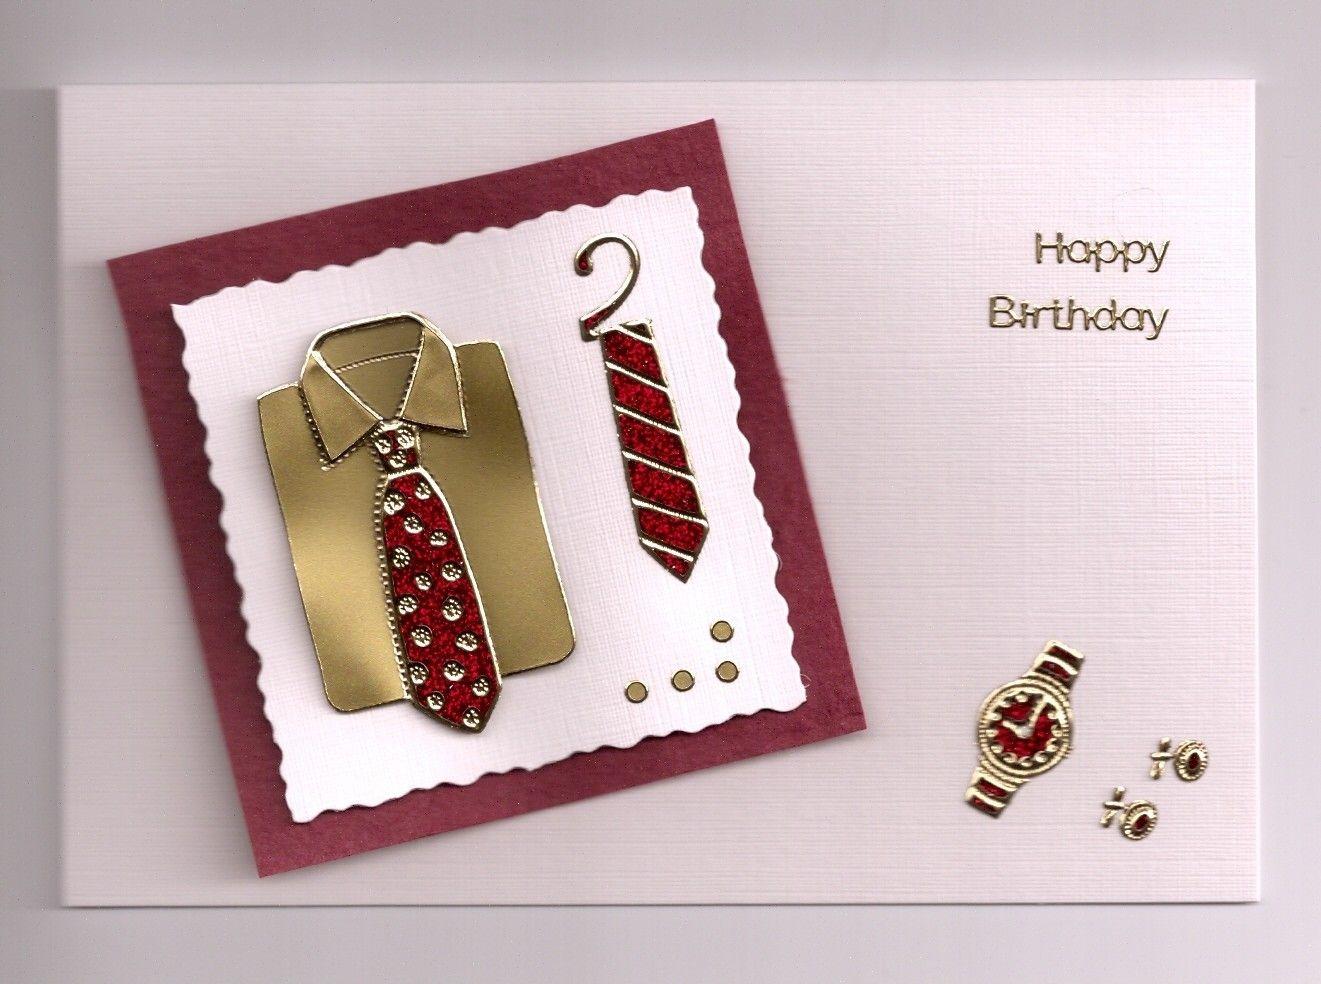 handmade birthday cards for men : let's celebrate! | masculine cards